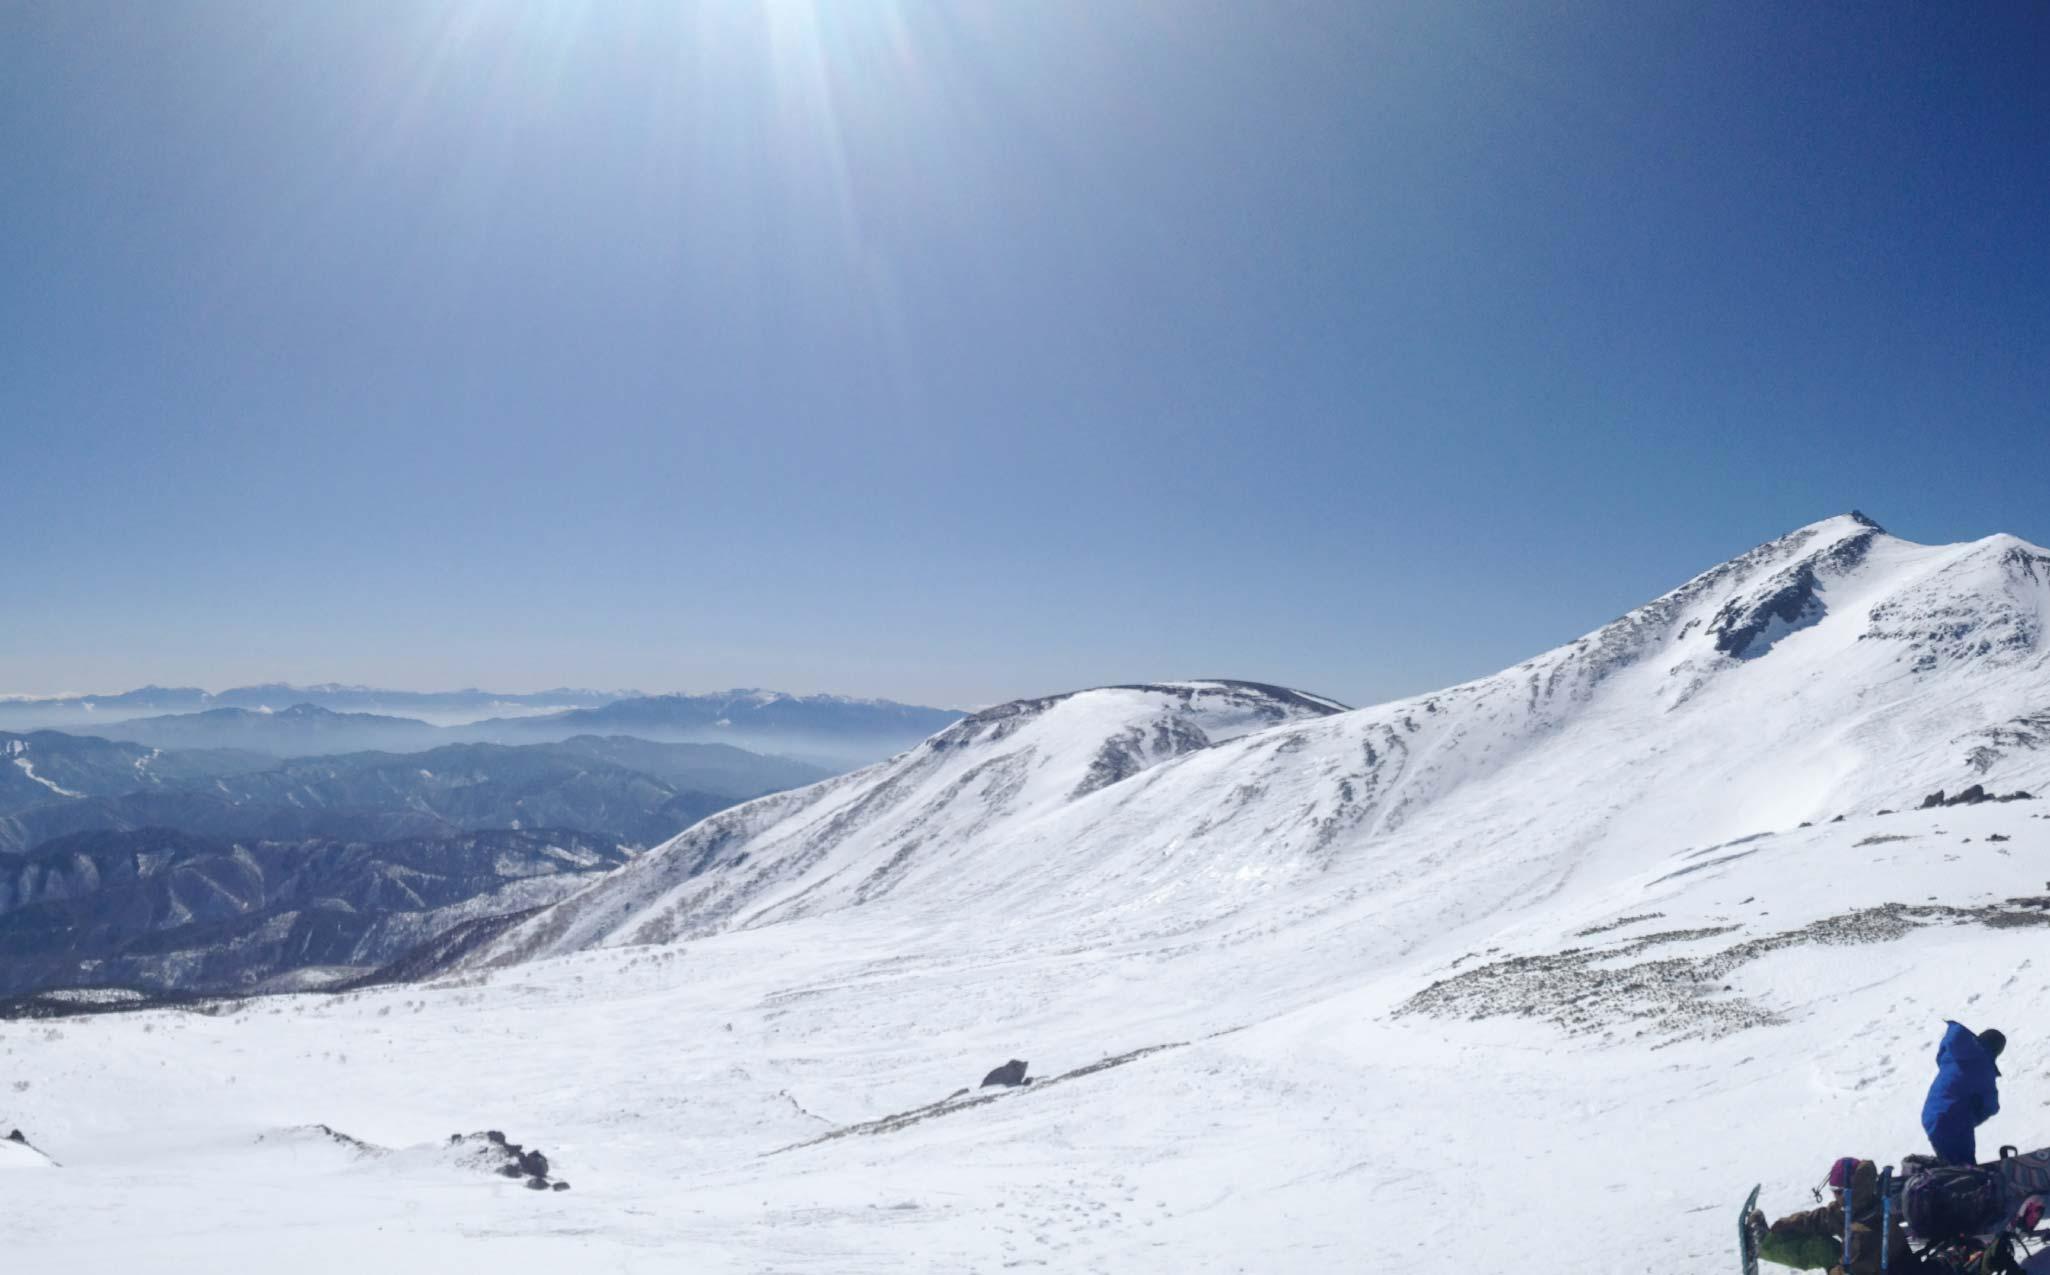 Mt. Norikura Backcountry Skiing & Snowboarding